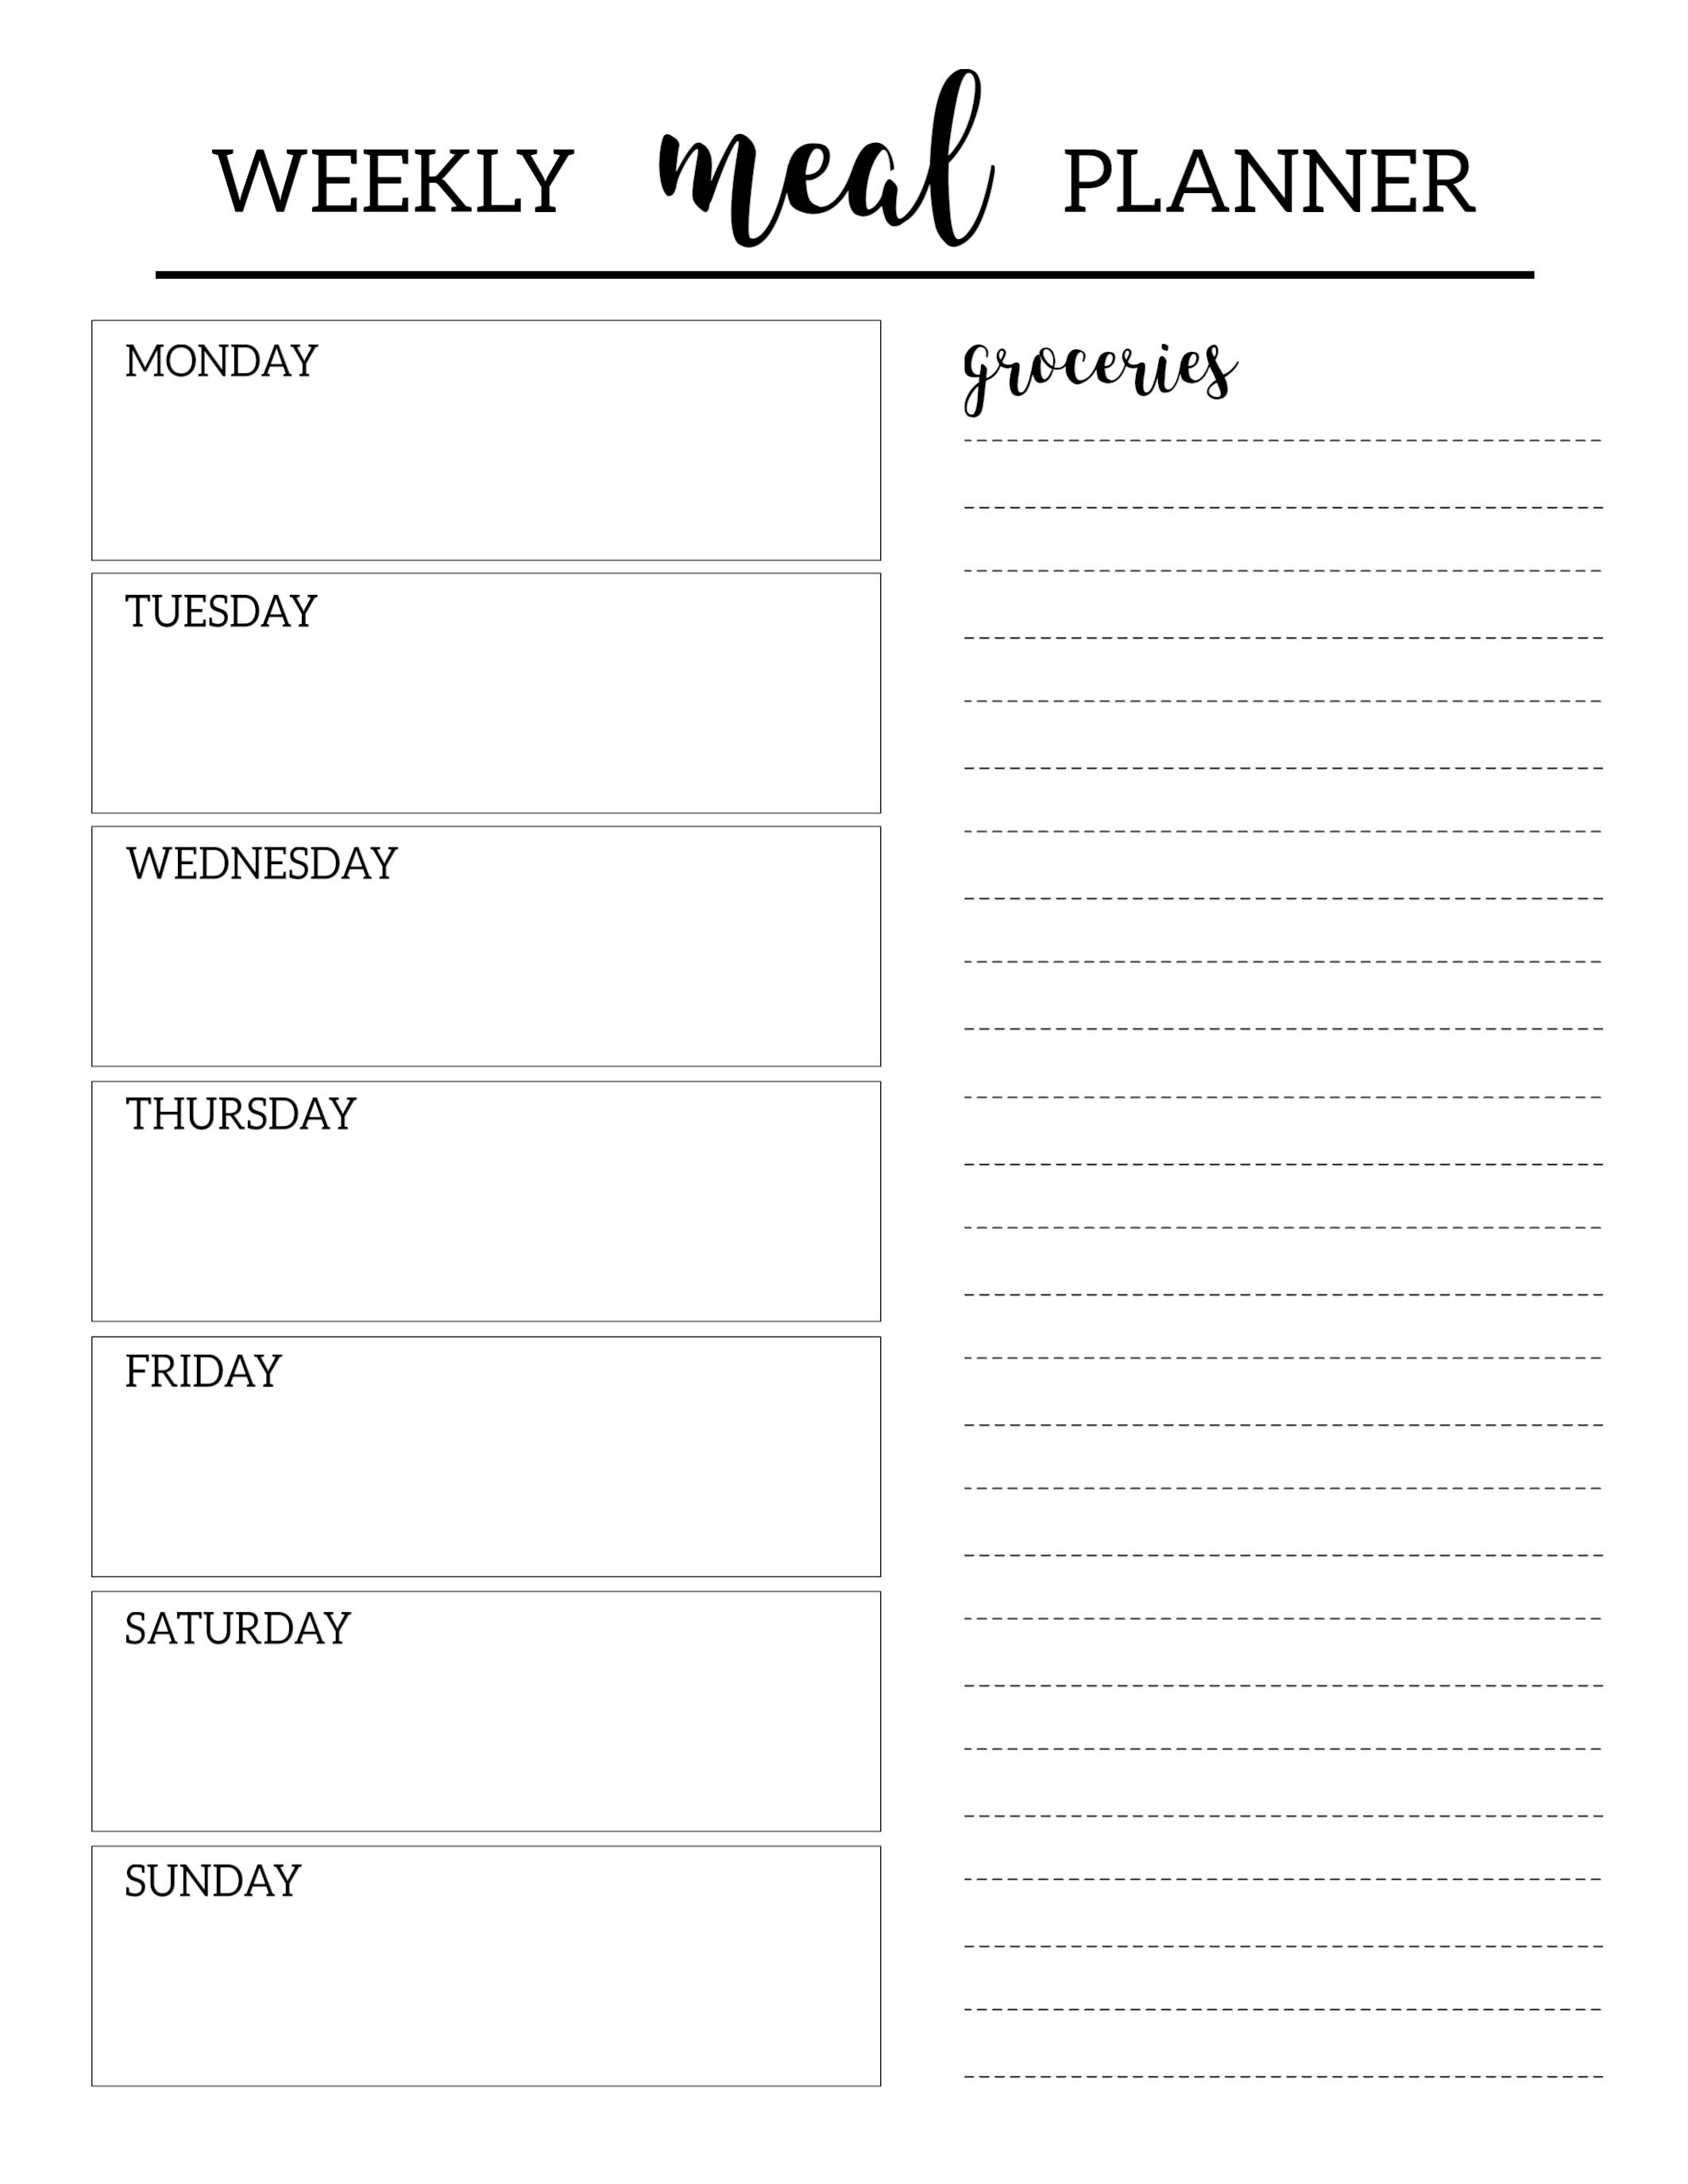 Blank Weekly Planner Printable Schedule Plate Free Daily Pages with Free Printable Weekly Planner Templates